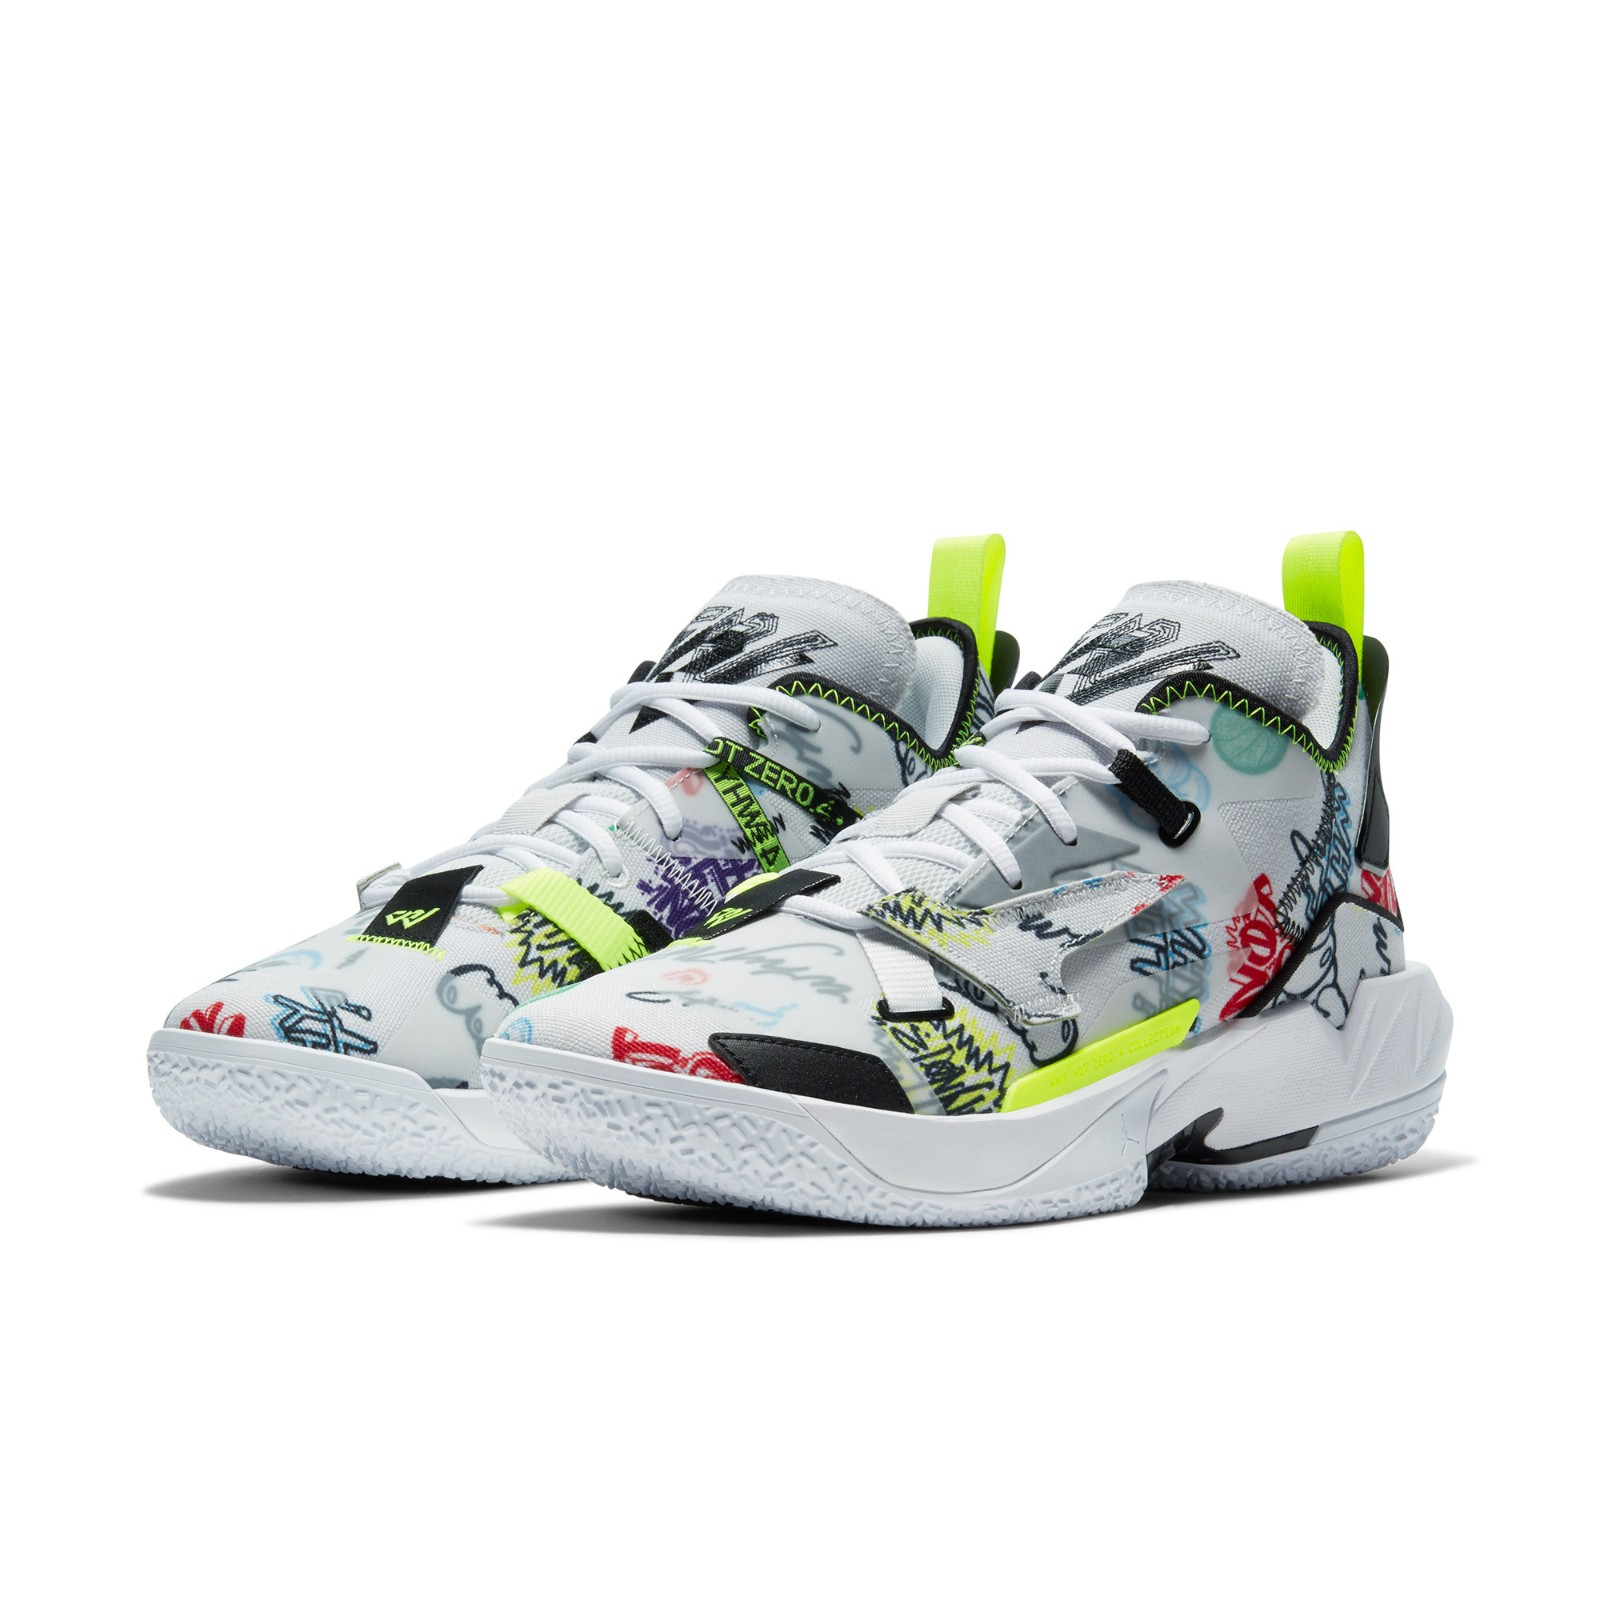 AIR JORDAN  WHY NOT ZER0.4 PF DD4886 男士篮球鞋